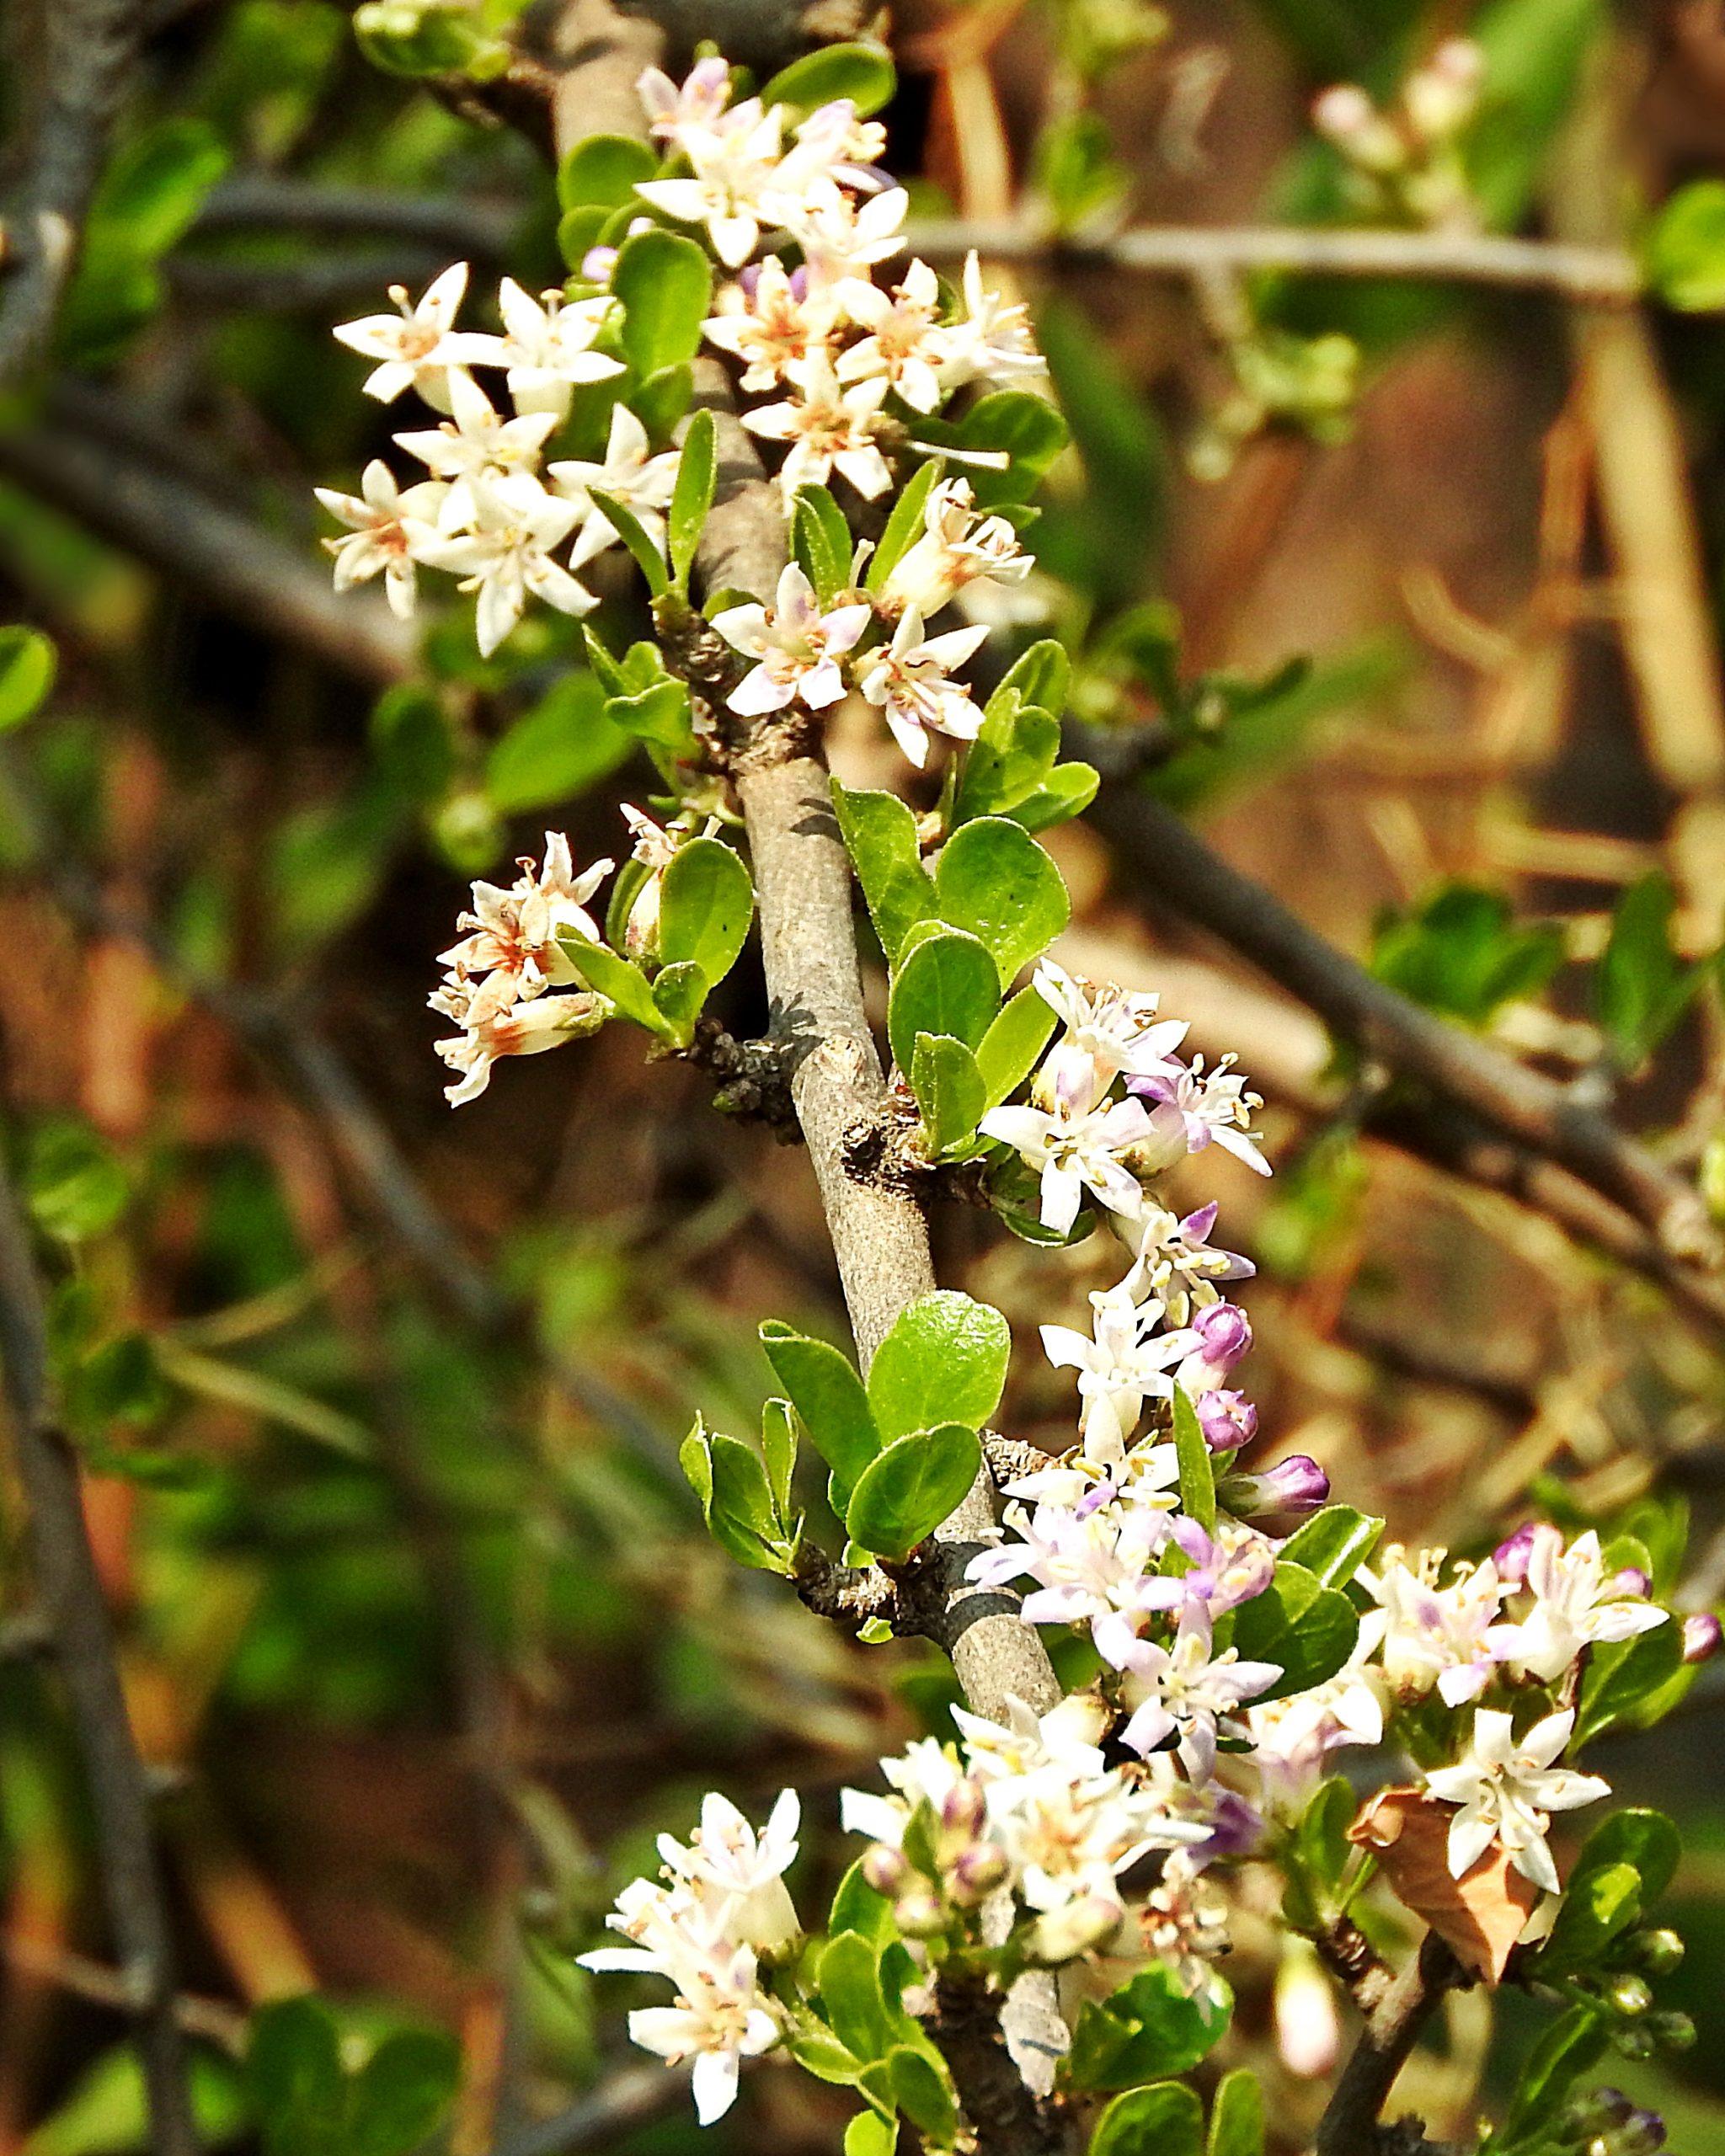 The clusters of Ehretia rigida are borne along the branches..